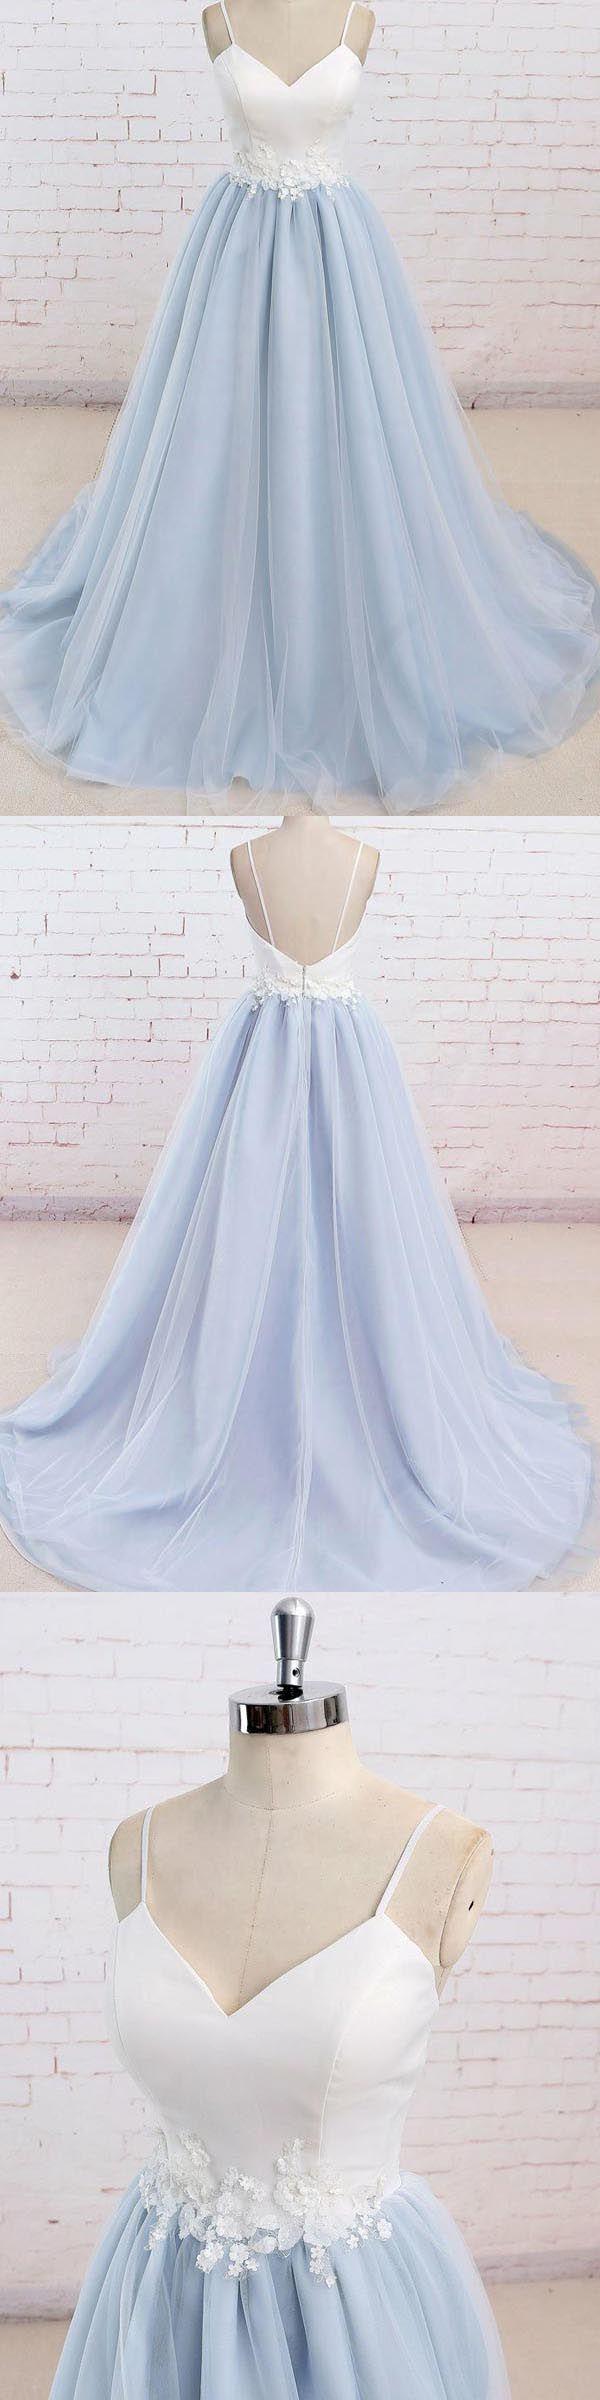 Spaghetti Straps Sweep Train Backless Lavender Tulle Prom Dress #kfashion,